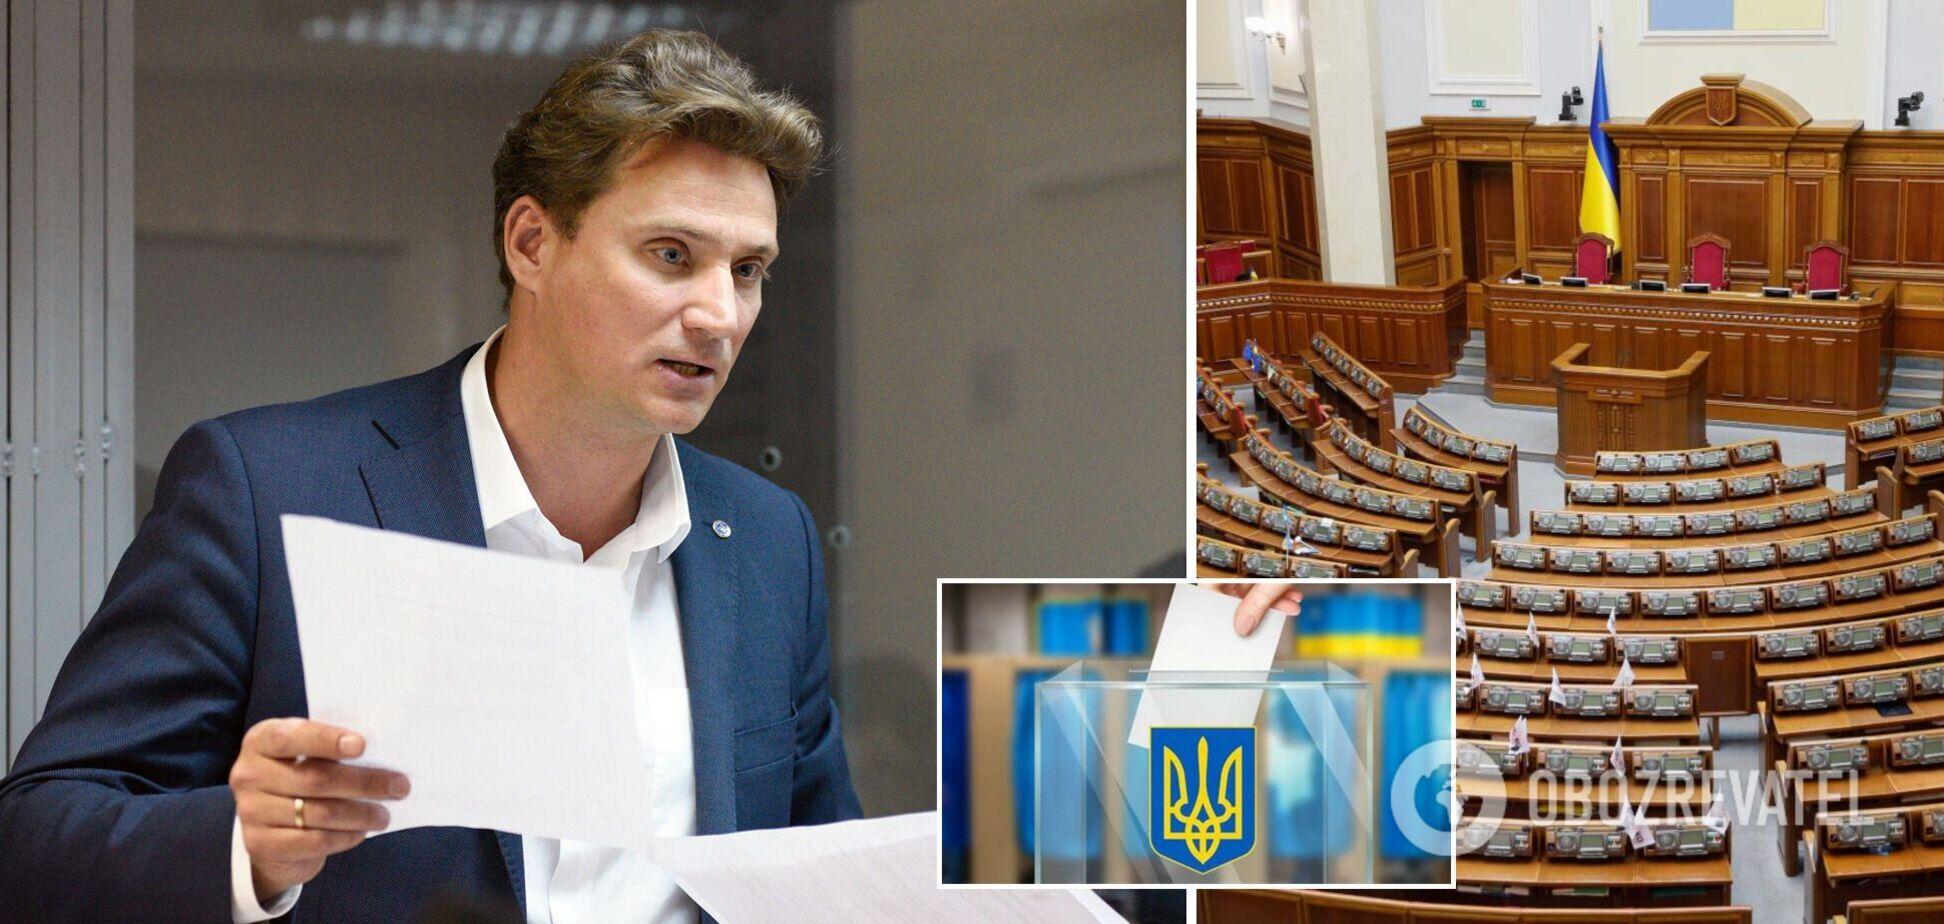 Валентин Рыбин адвокат